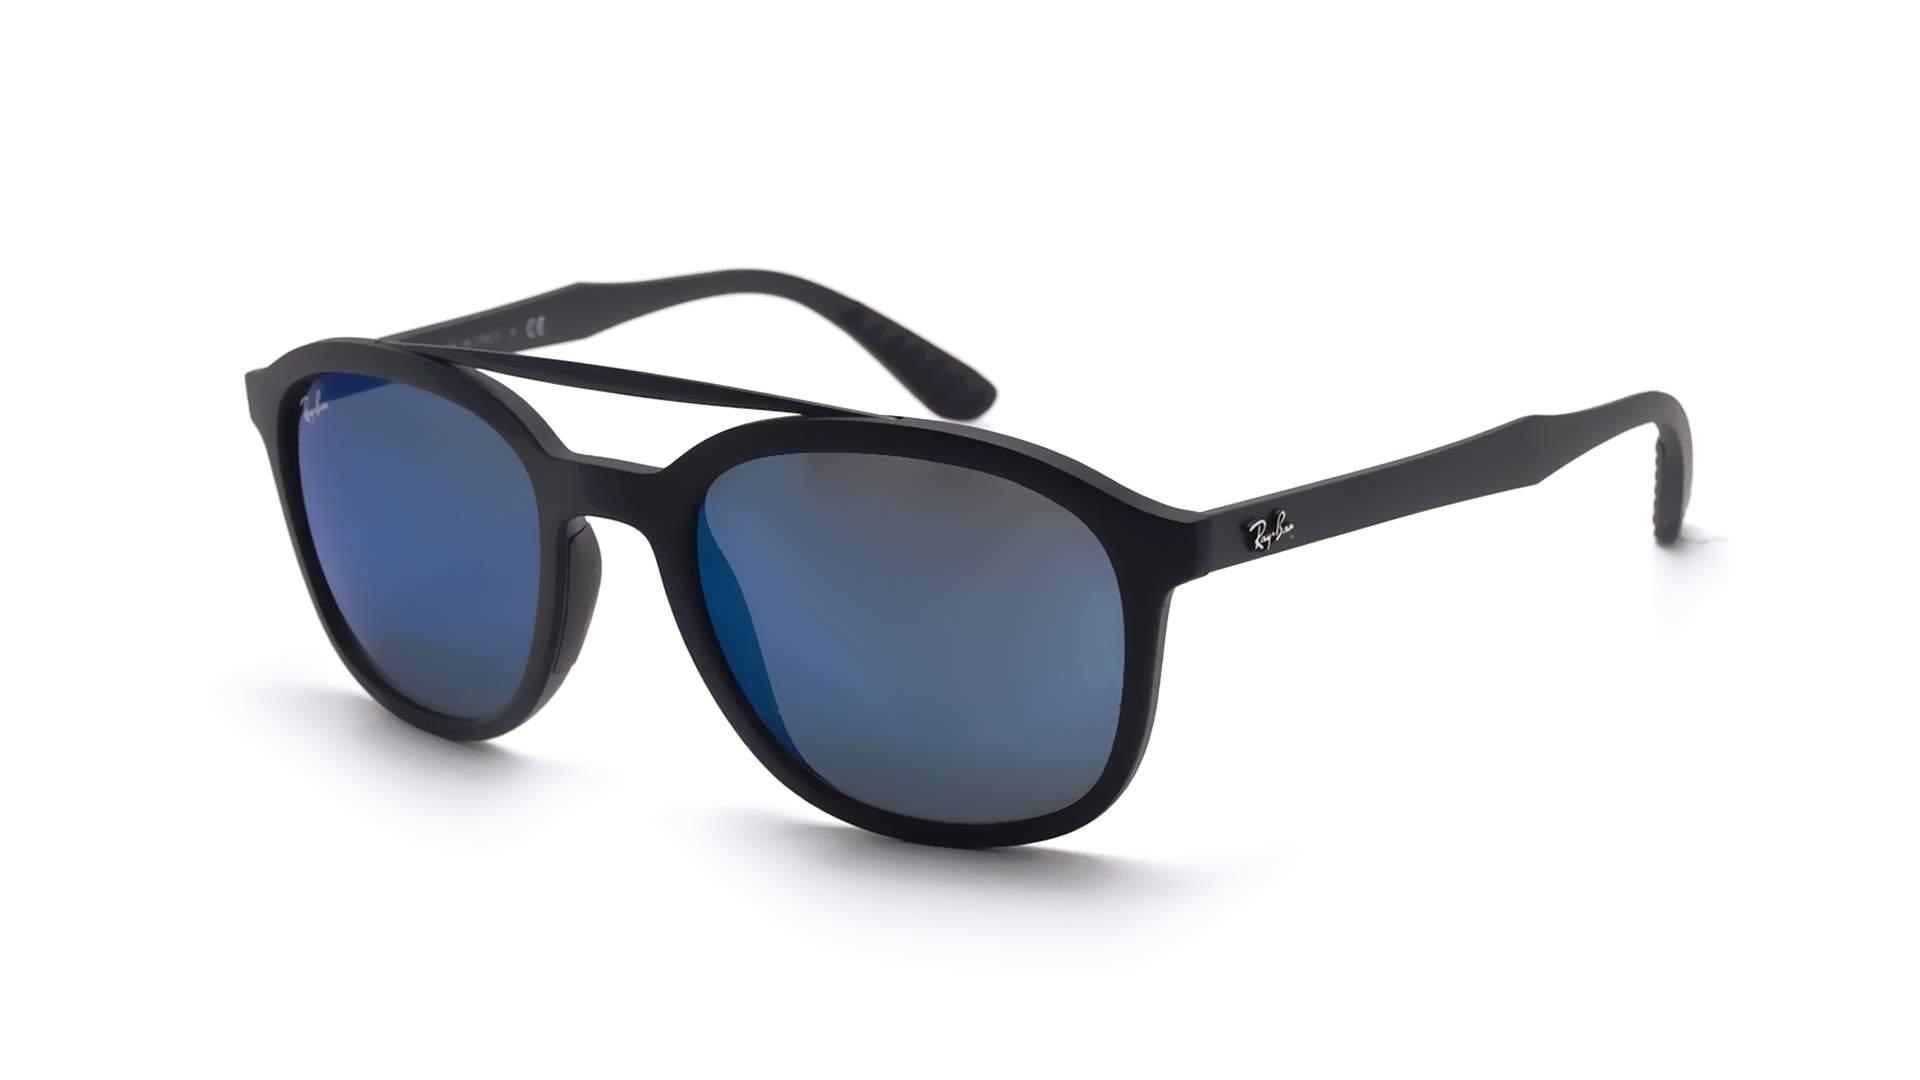 30d7da48d8 Sunglasses Ray-Ban RB4290 601S 55 53-21 Black Matte Large Mirror